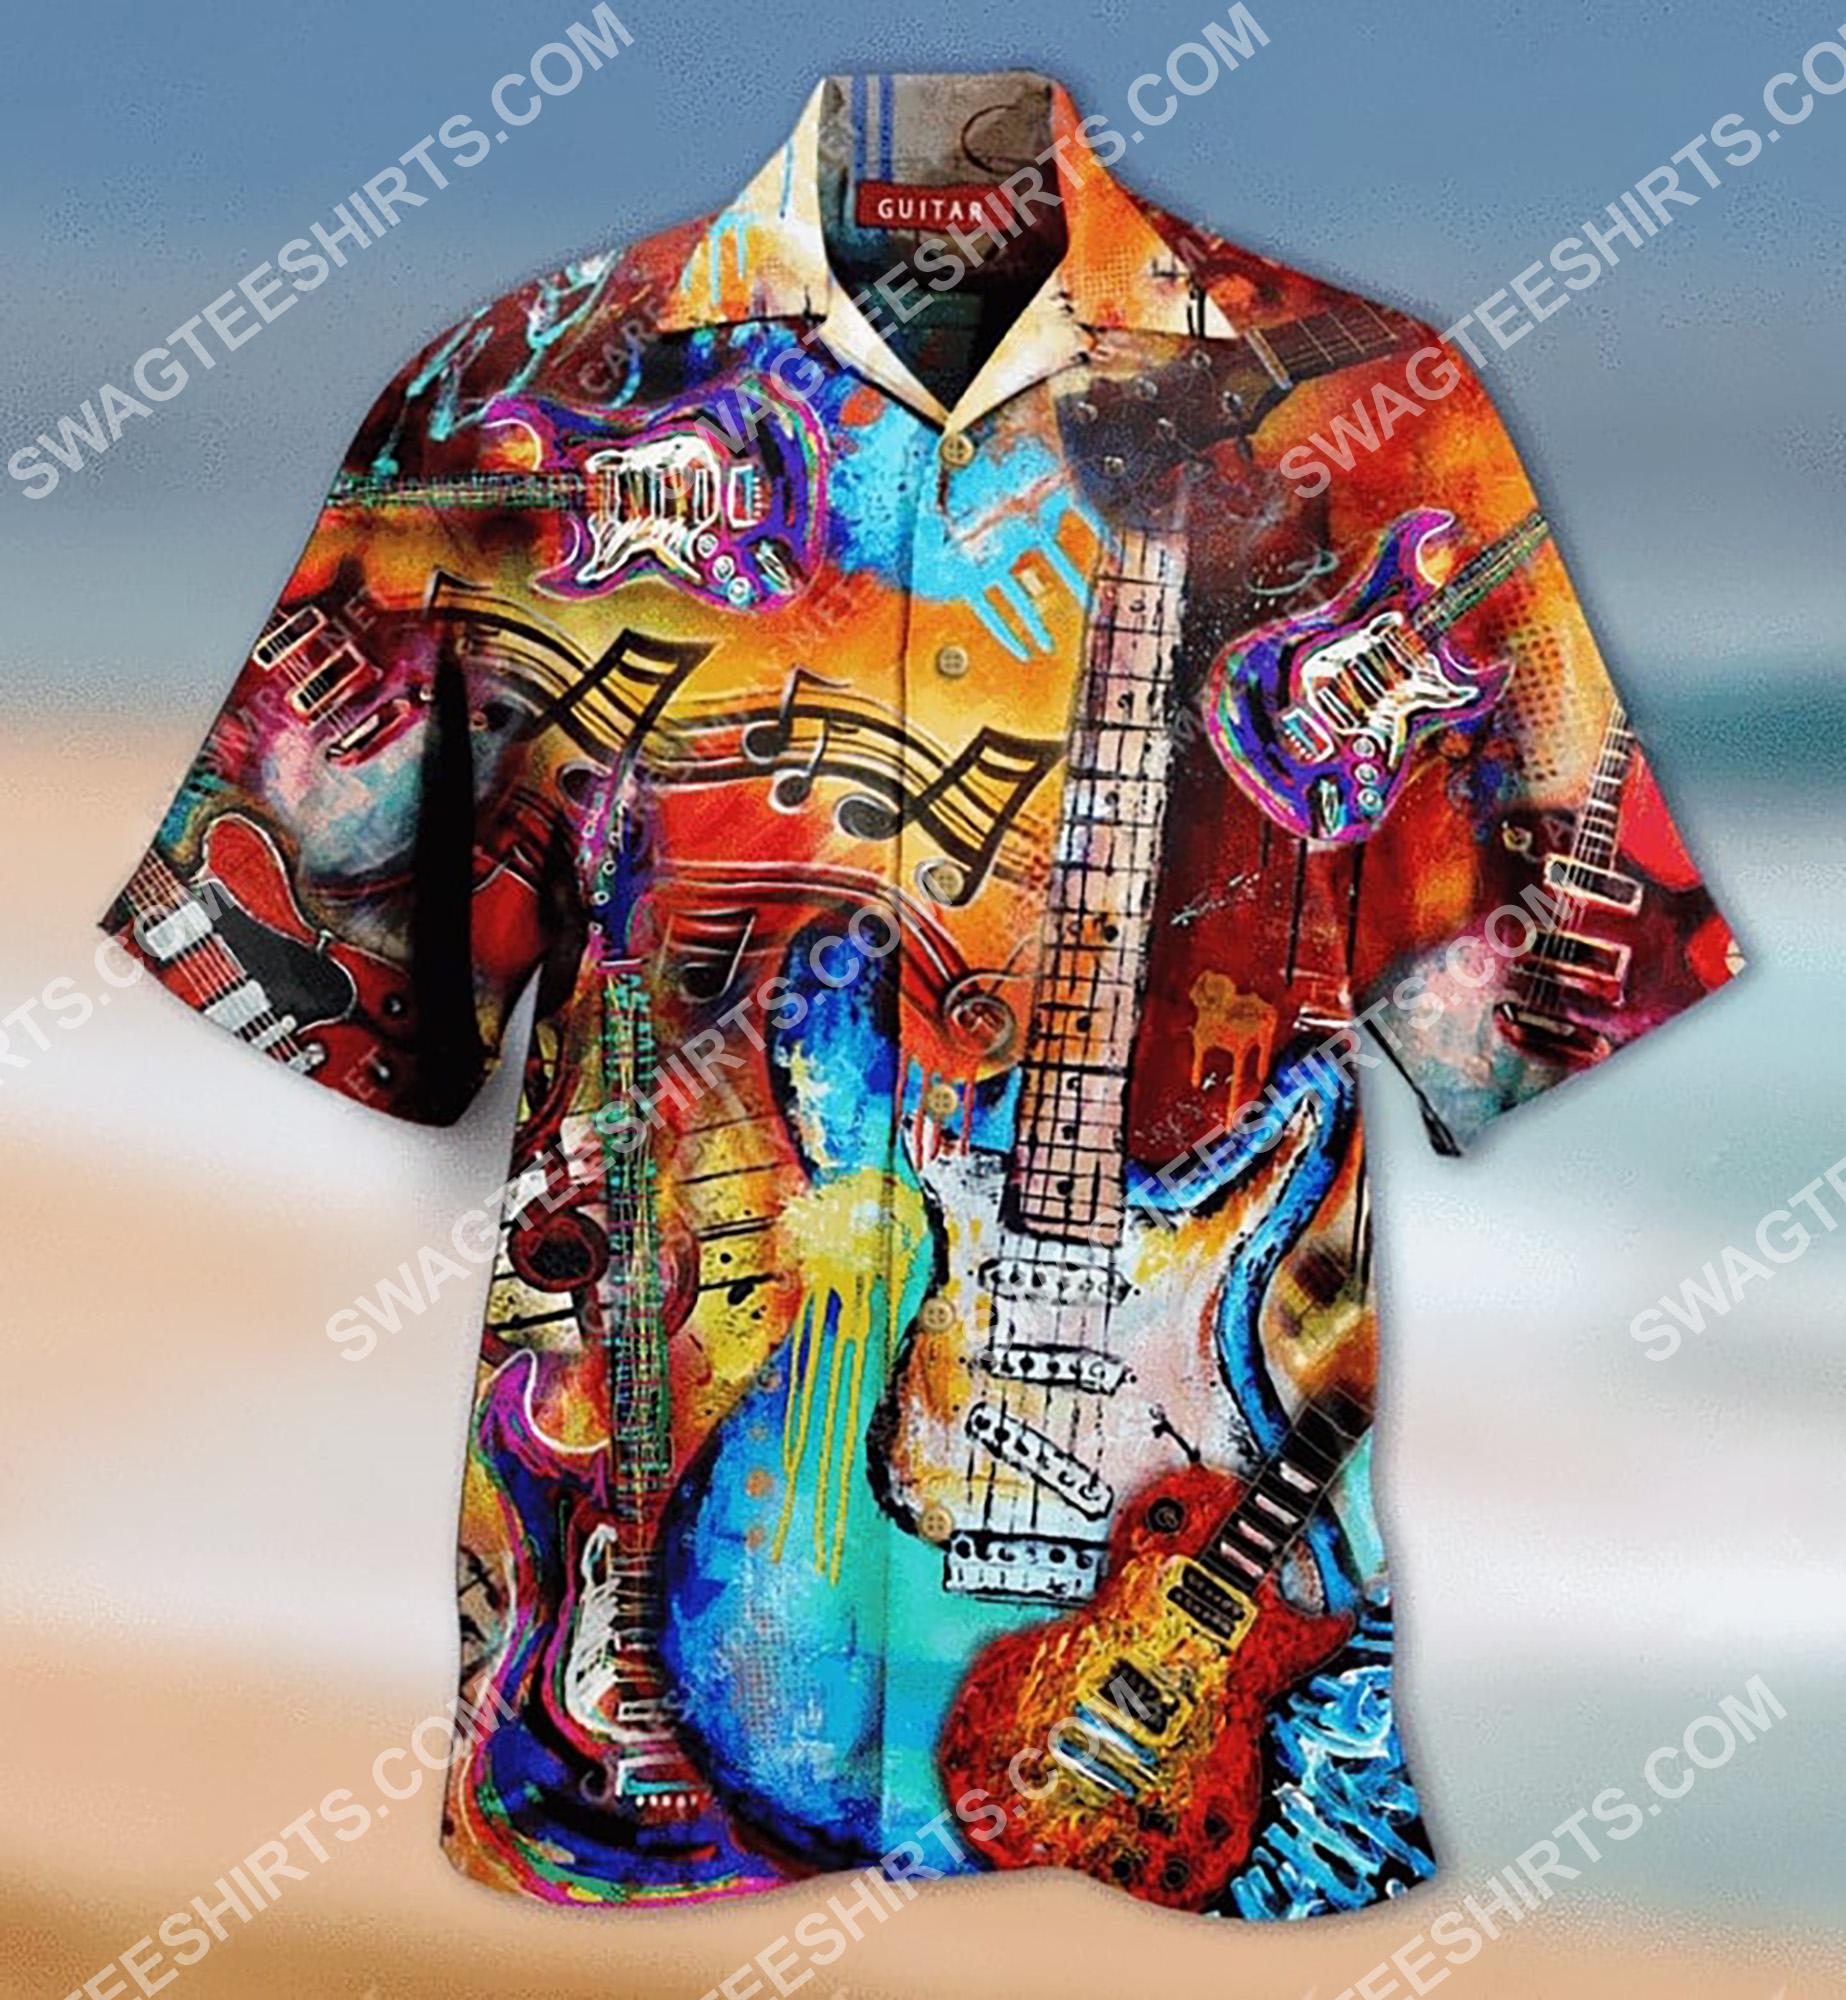 vintage guitar colorful all over printing hawaiian shirt 2(3) - Copy